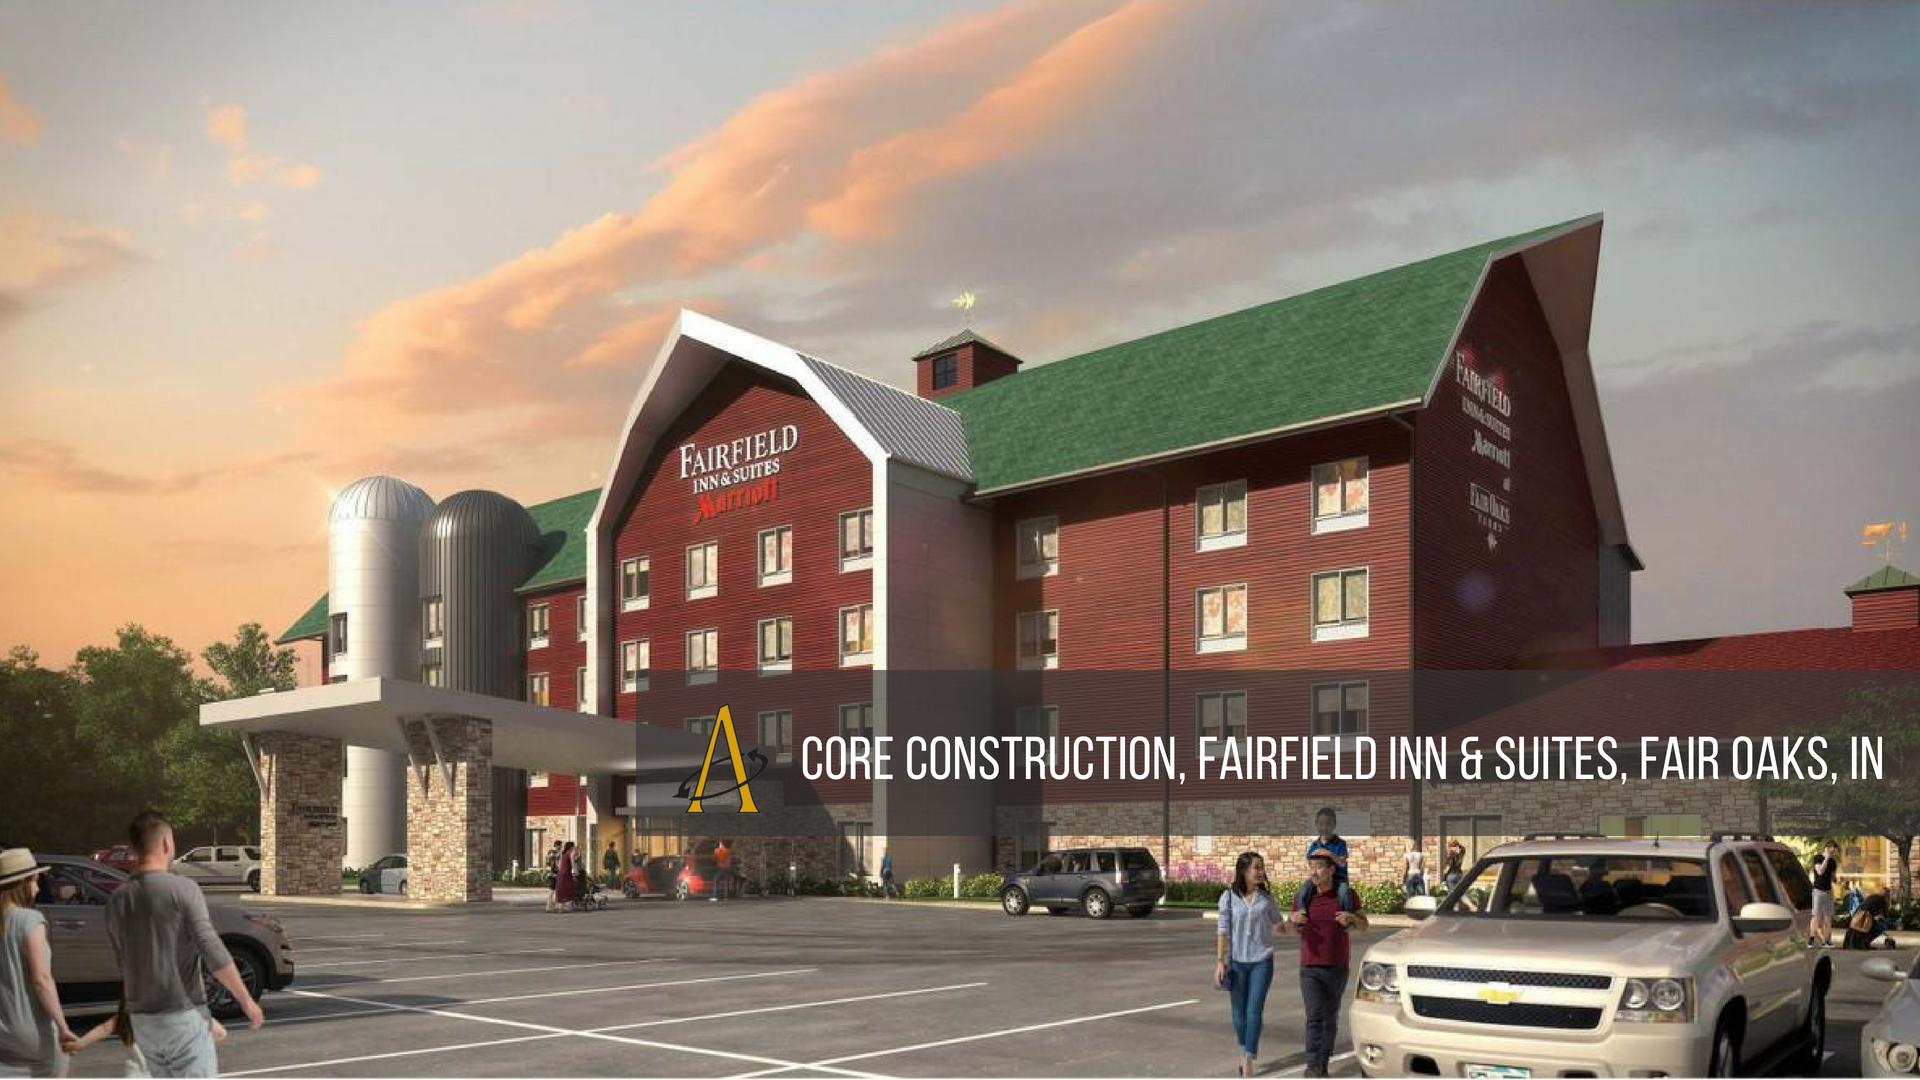 Core Construction, Fairfield Inn & Suites, Fair Oaks, IN